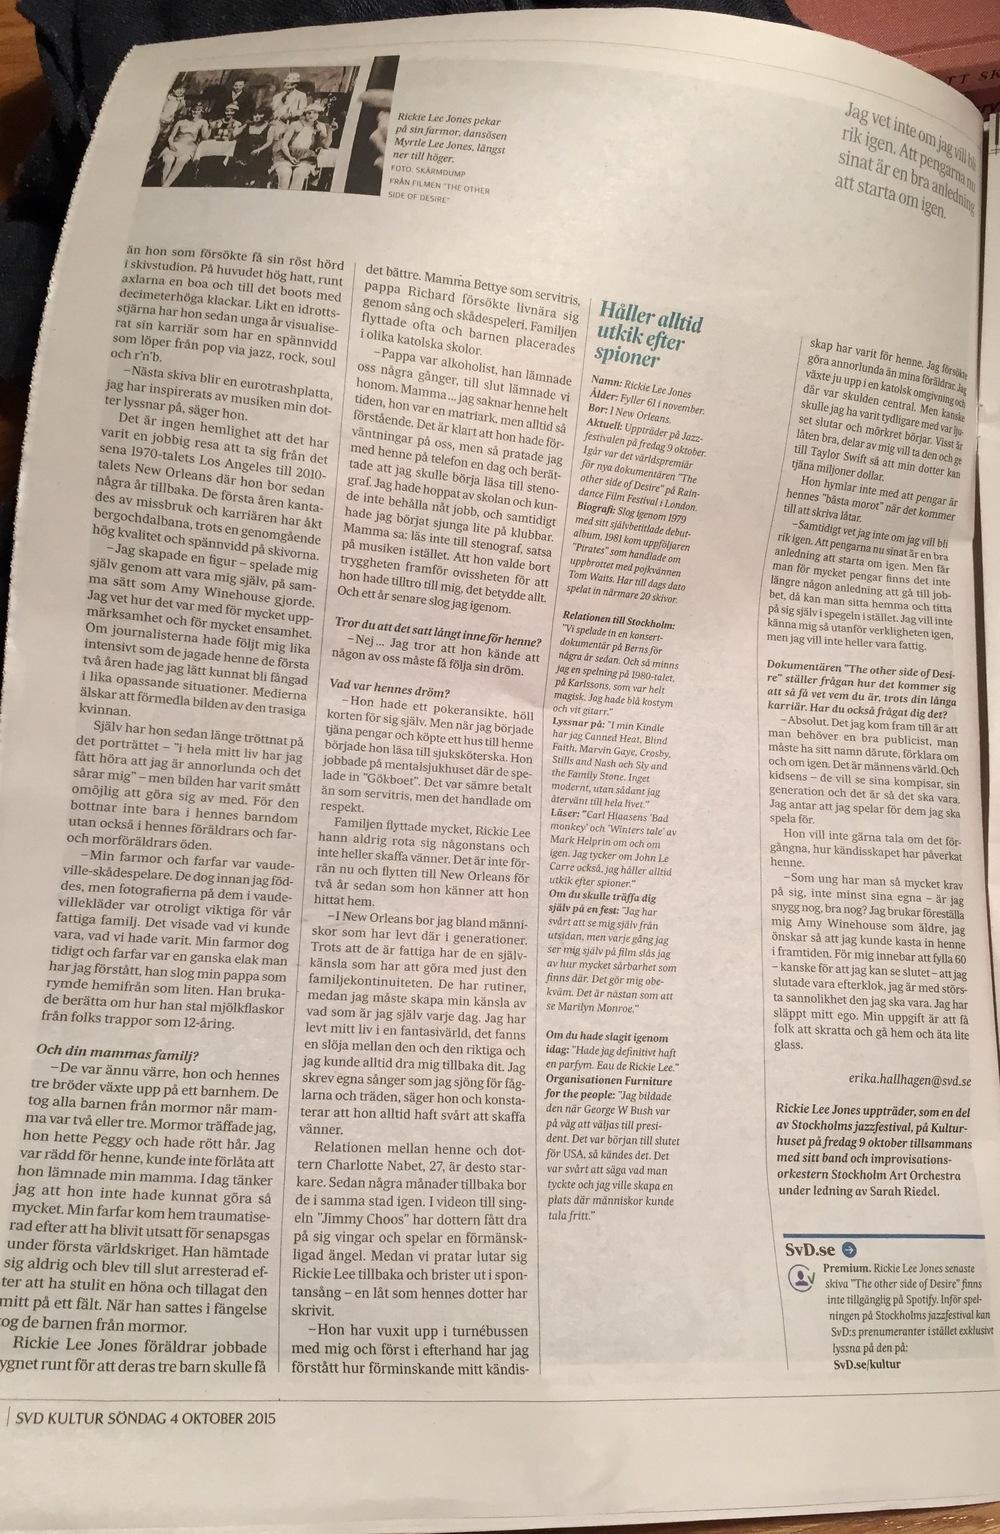 SvD intervju sid. 2 - Rickie.jpg